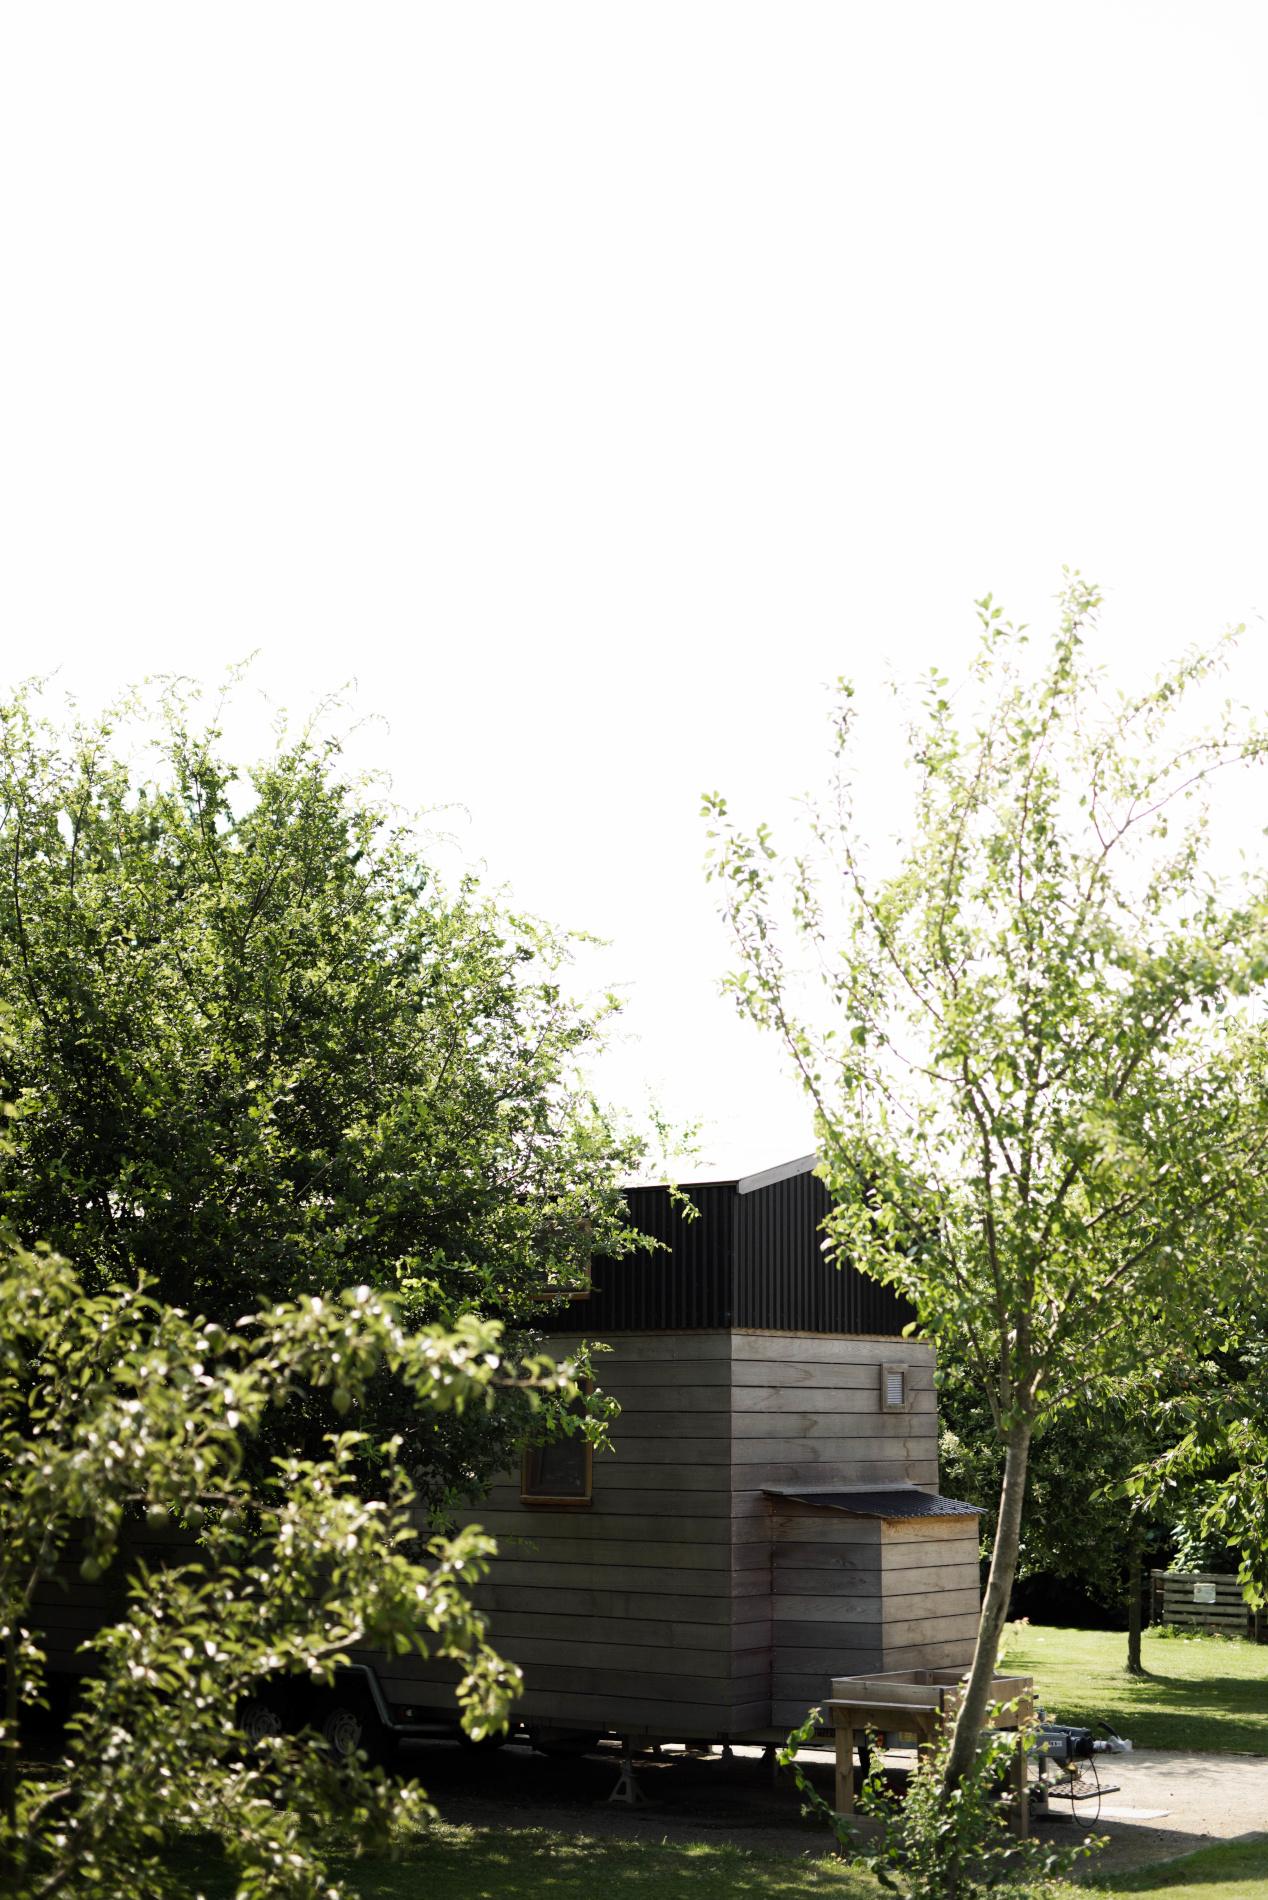 Tiny House installée dans un verger